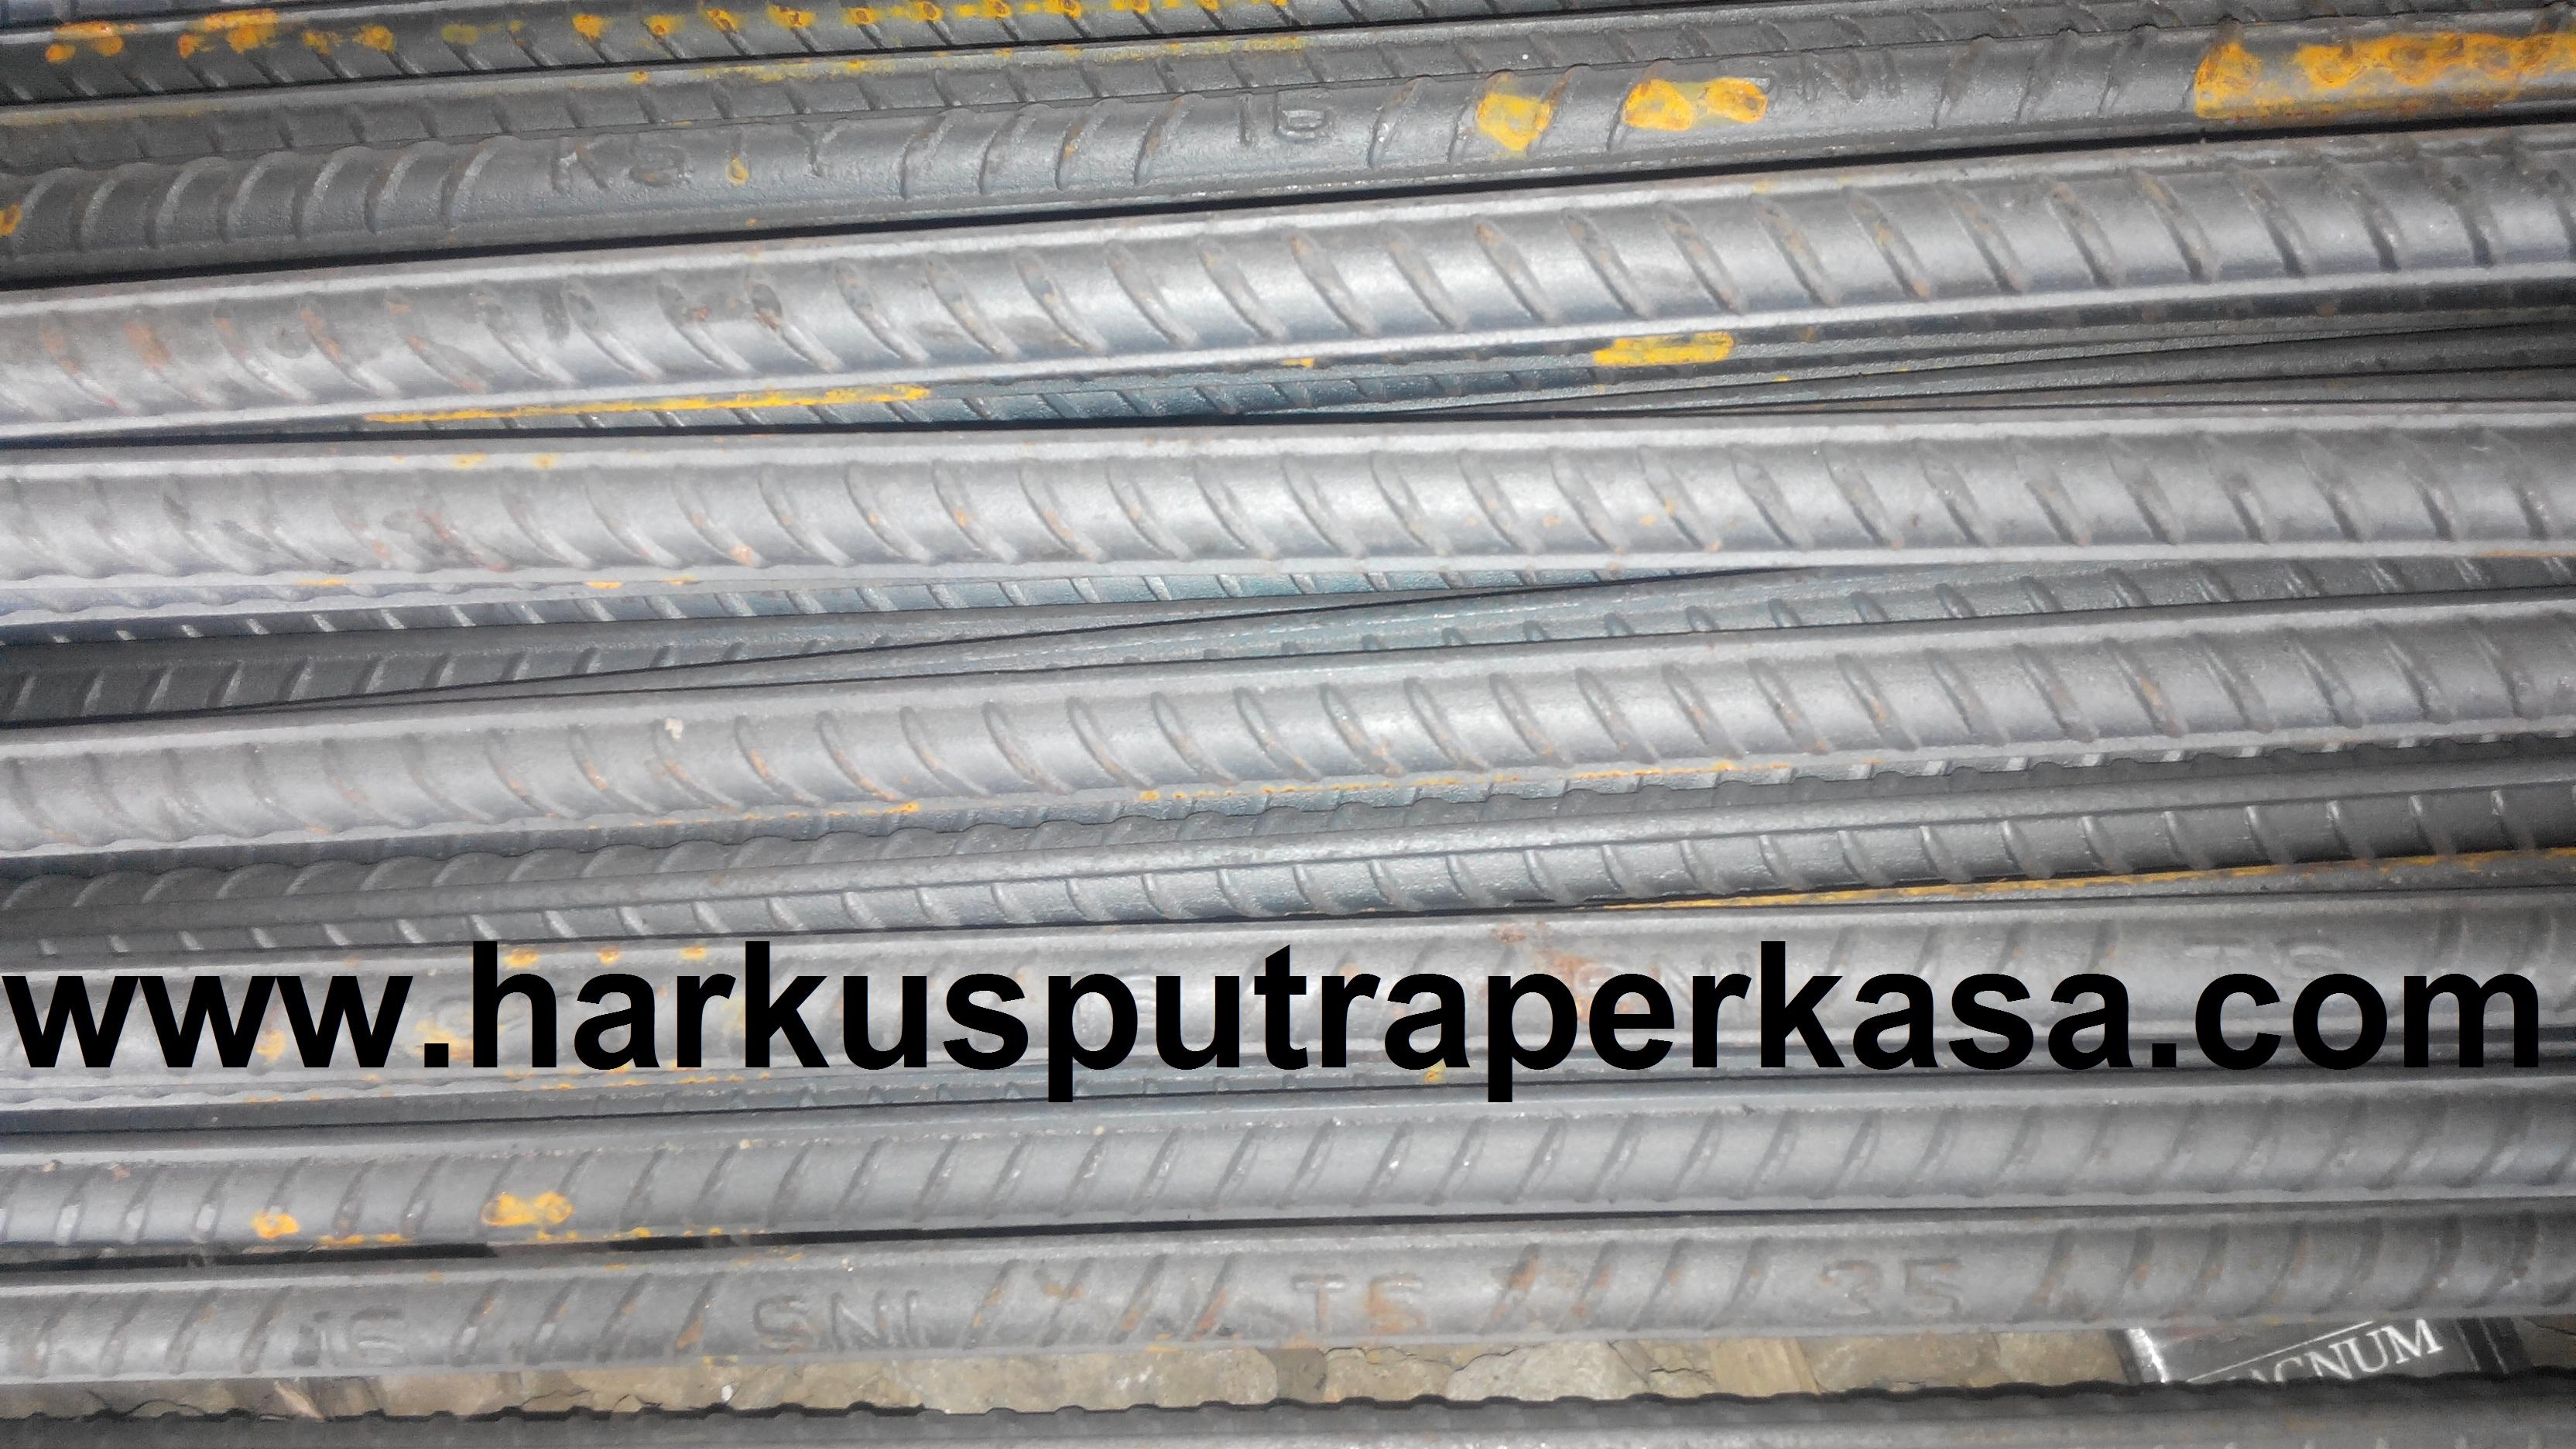 Distributor Besi Beton di Jakarta Selatan